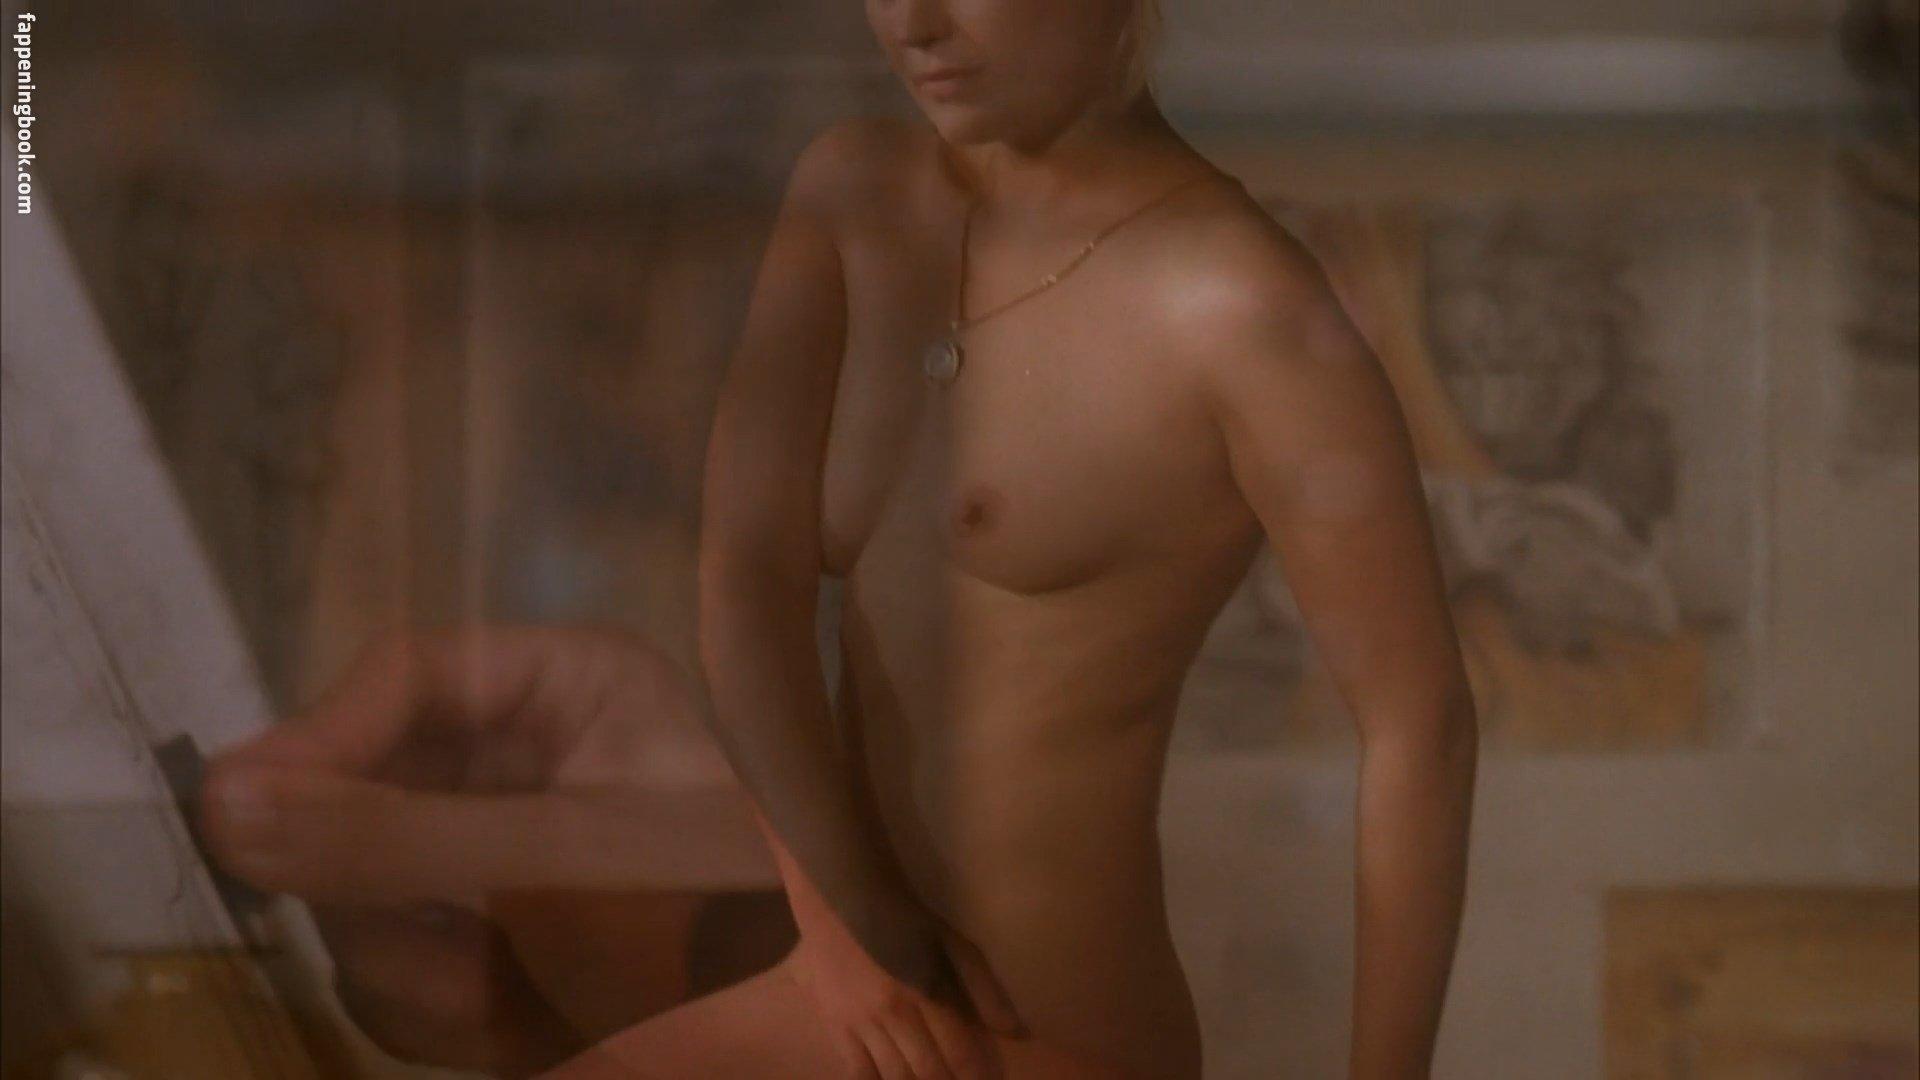 hot naked biracial pussy